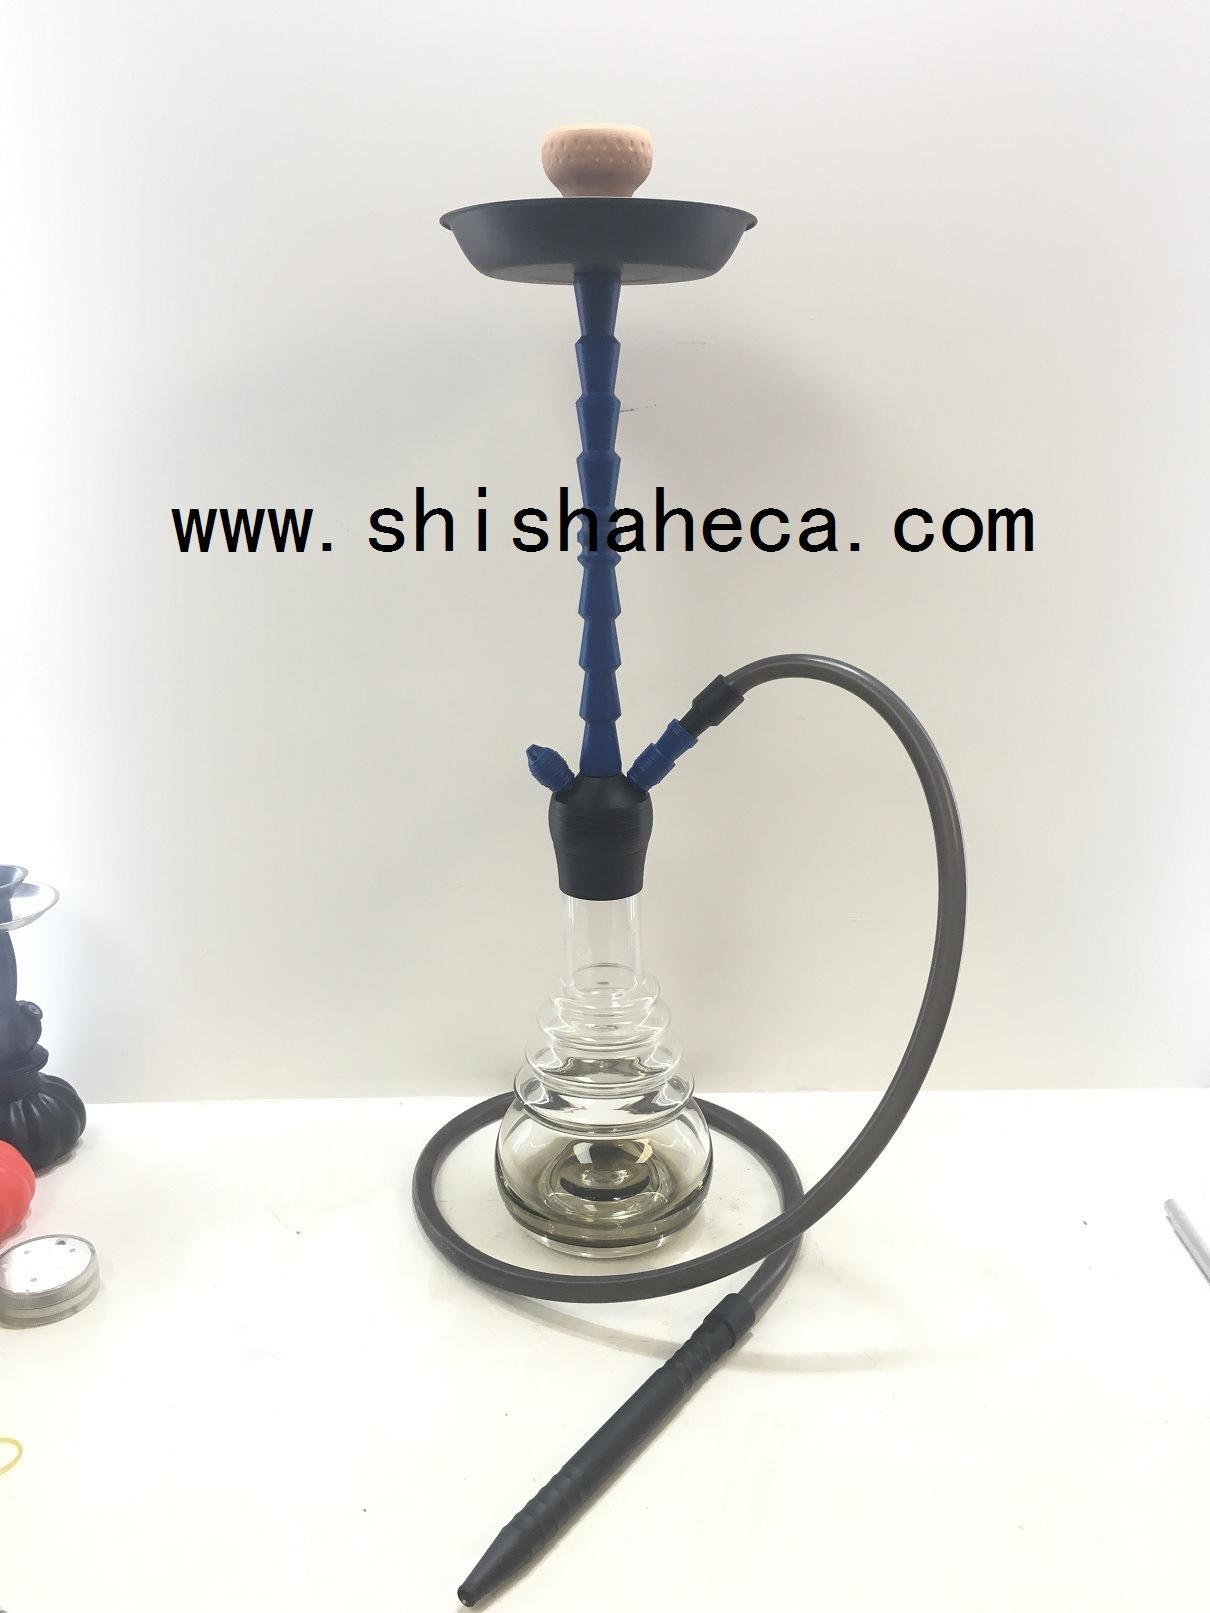 2017 Wholesale High Quality Zinc Alloy Shisha Nargile Smoking Pipe Hookah